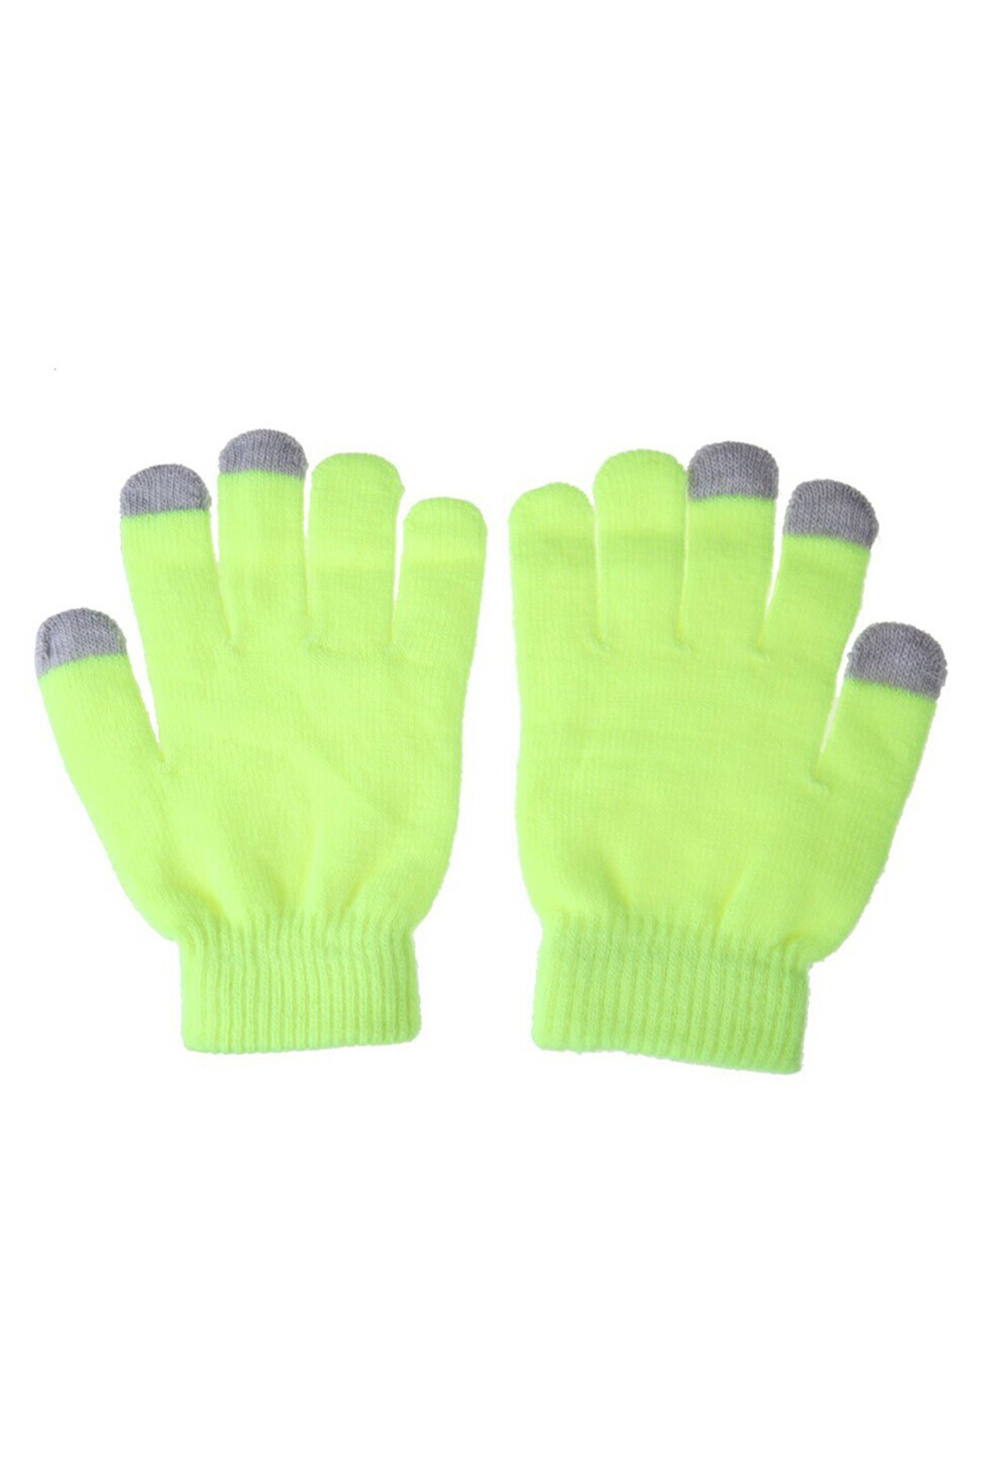 Mens gloves for smartphones - Women Men Touch Screen Soft Cotton Winter Gloves Warmer Gloves For Smartphones Fluorescent Green